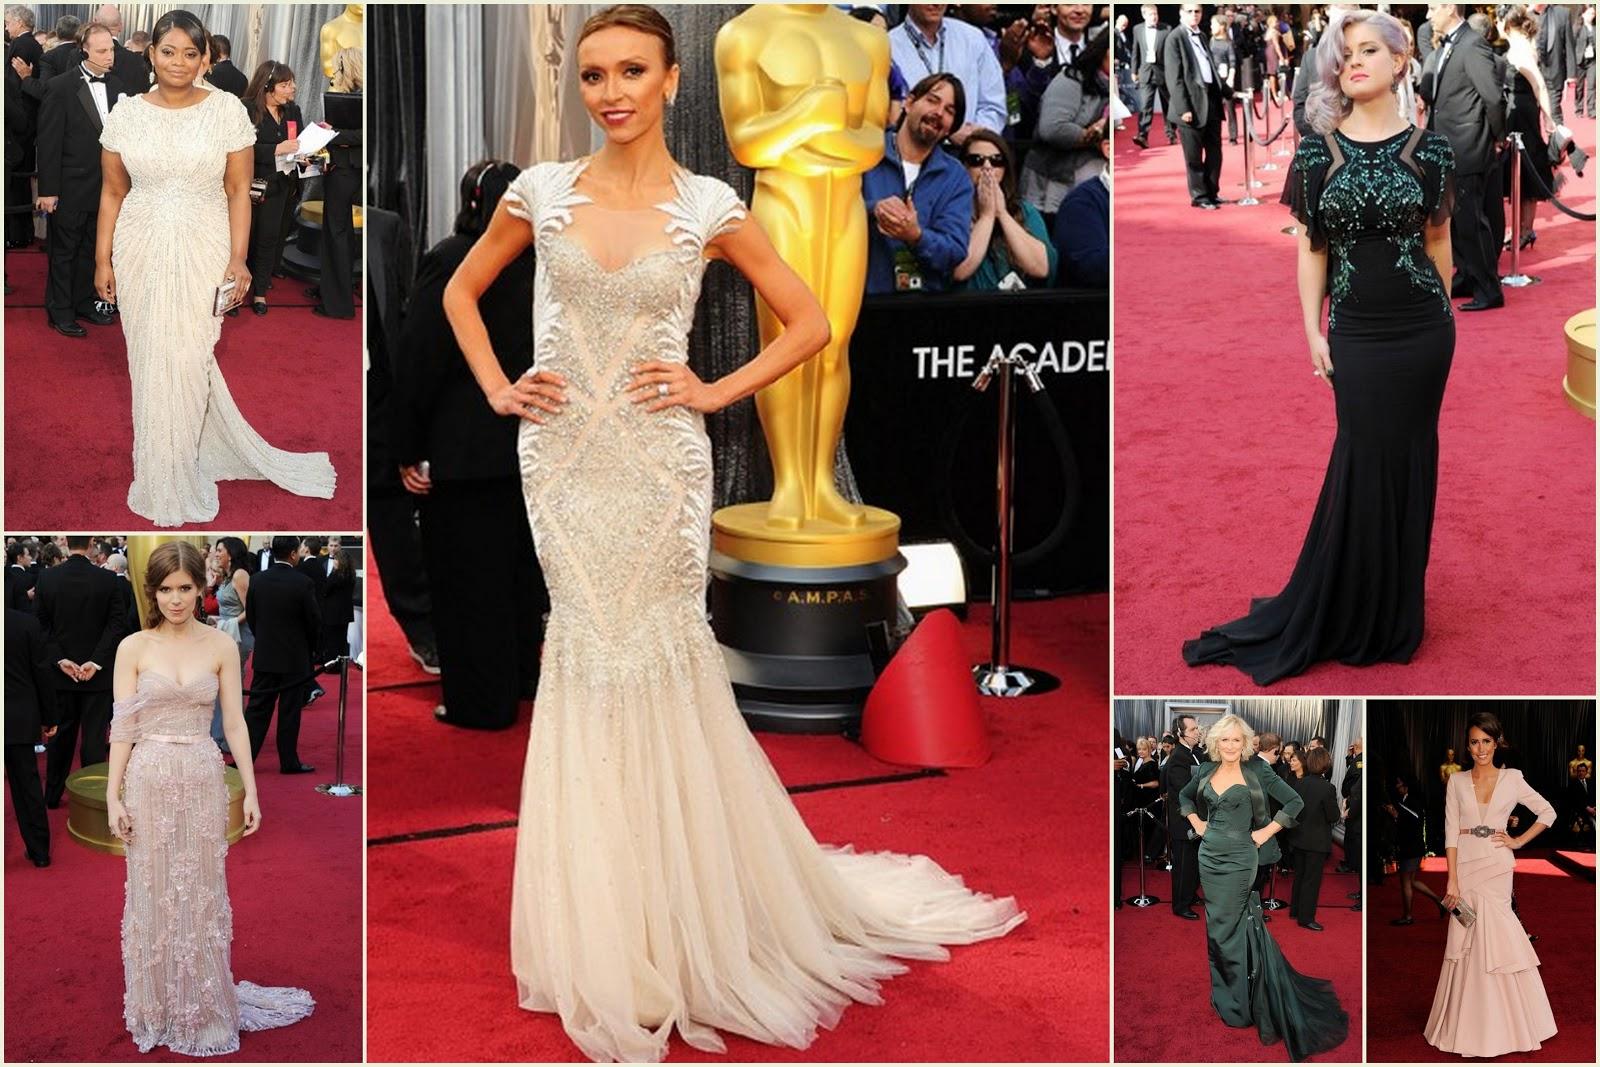 http://3.bp.blogspot.com/-3niapvX6bDc/T1QHOY7kEkI/AAAAAAAAAEo/vxFsNs_Bgd0/s1600/Oscars+20122.jpg